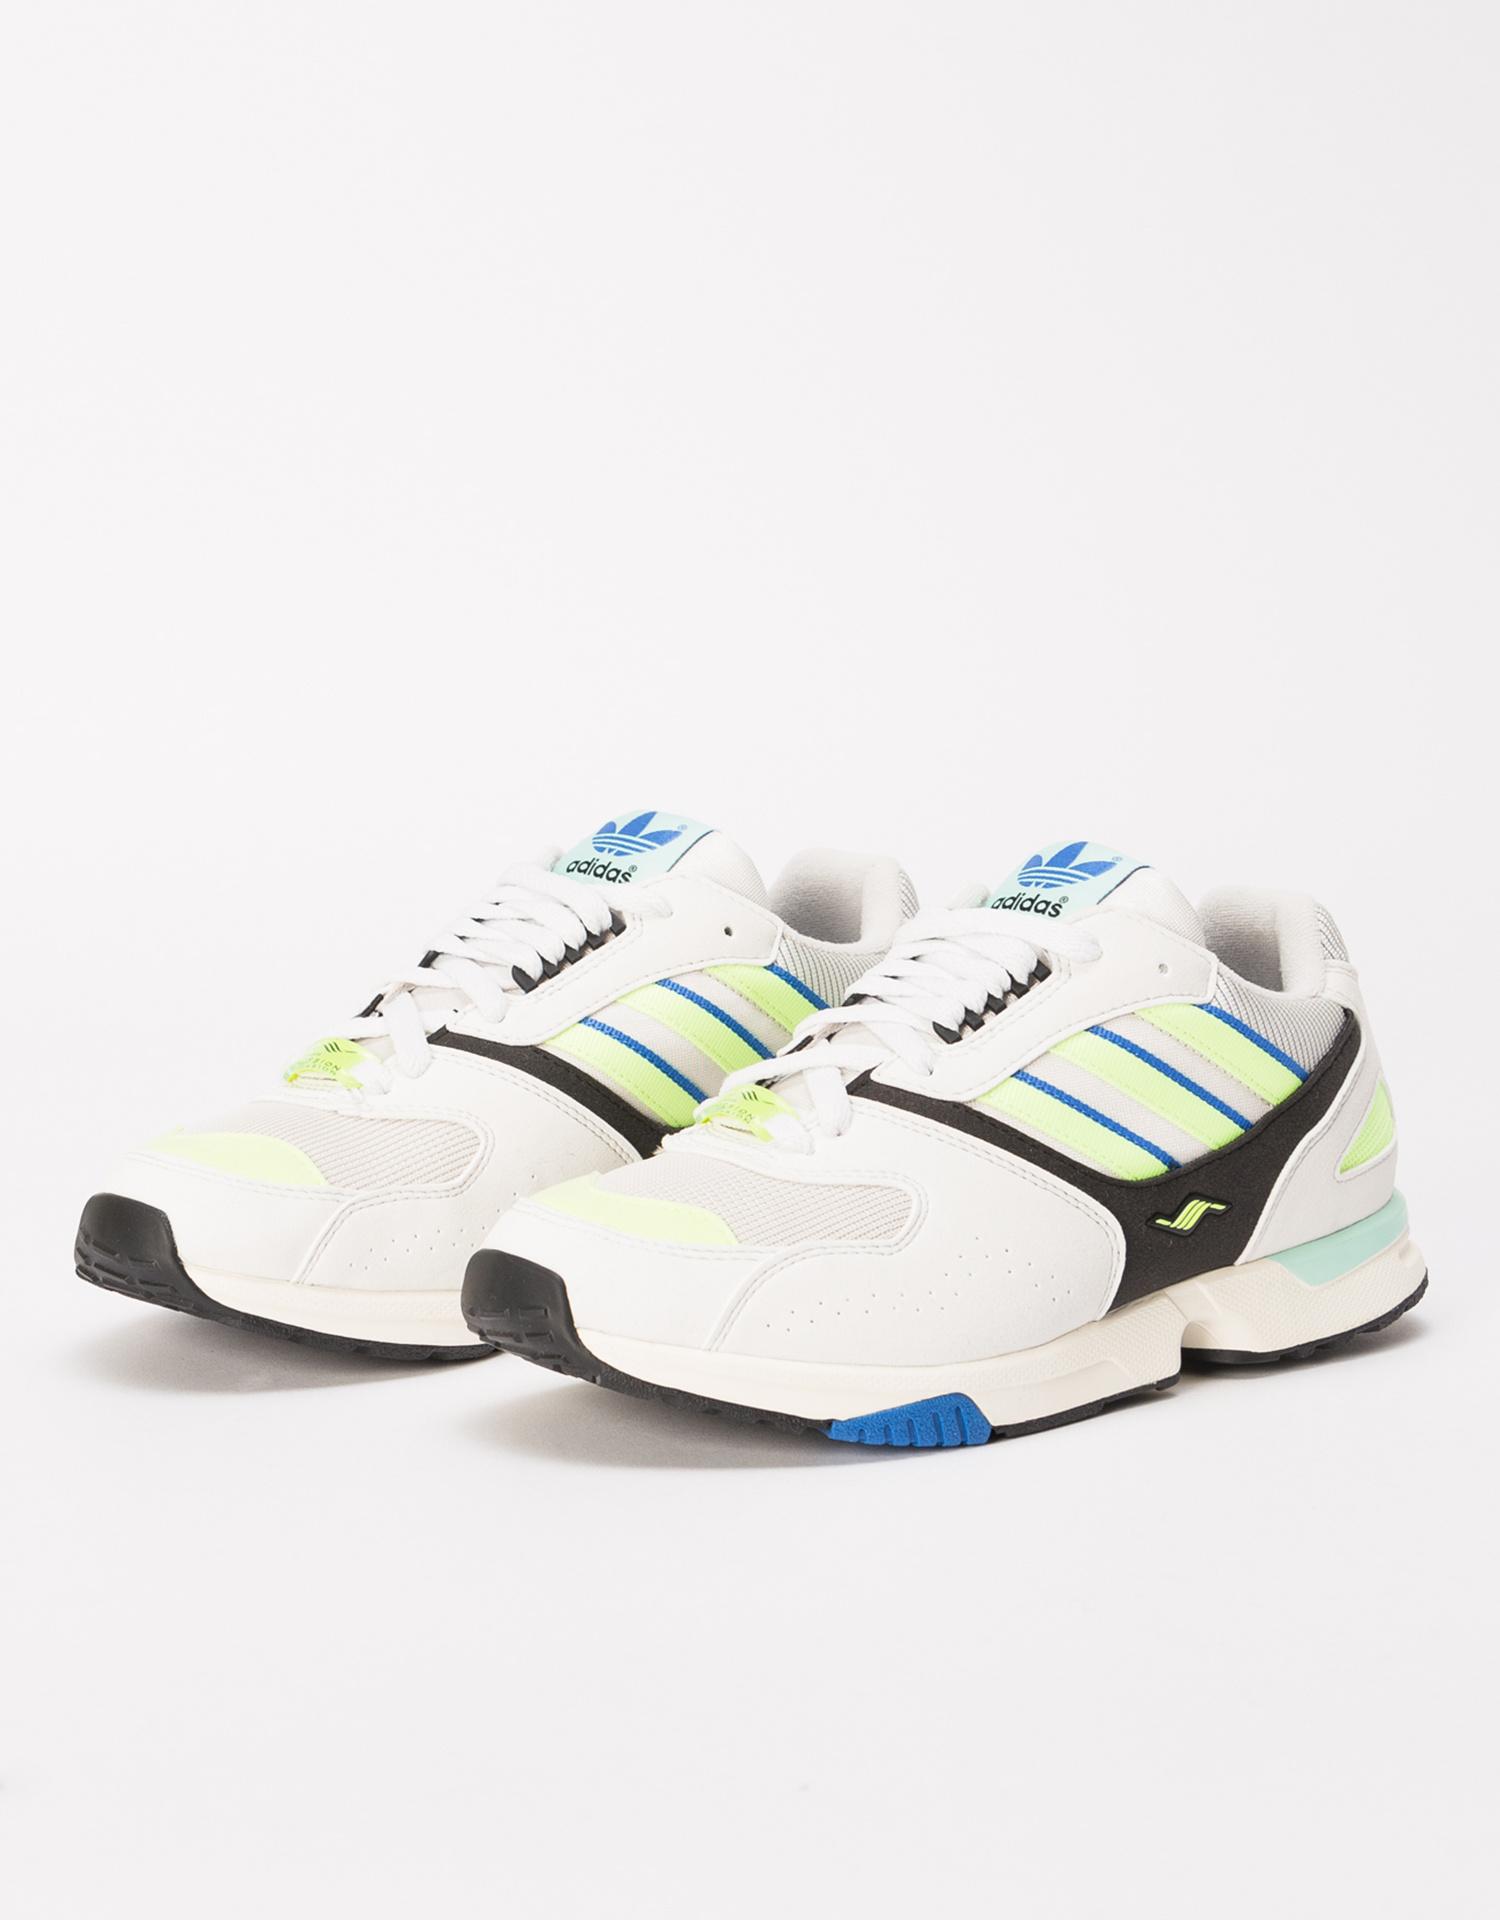 e472273e0f8 Adidas zx 4000 crywht/sesoye/cblack - Avenue Store